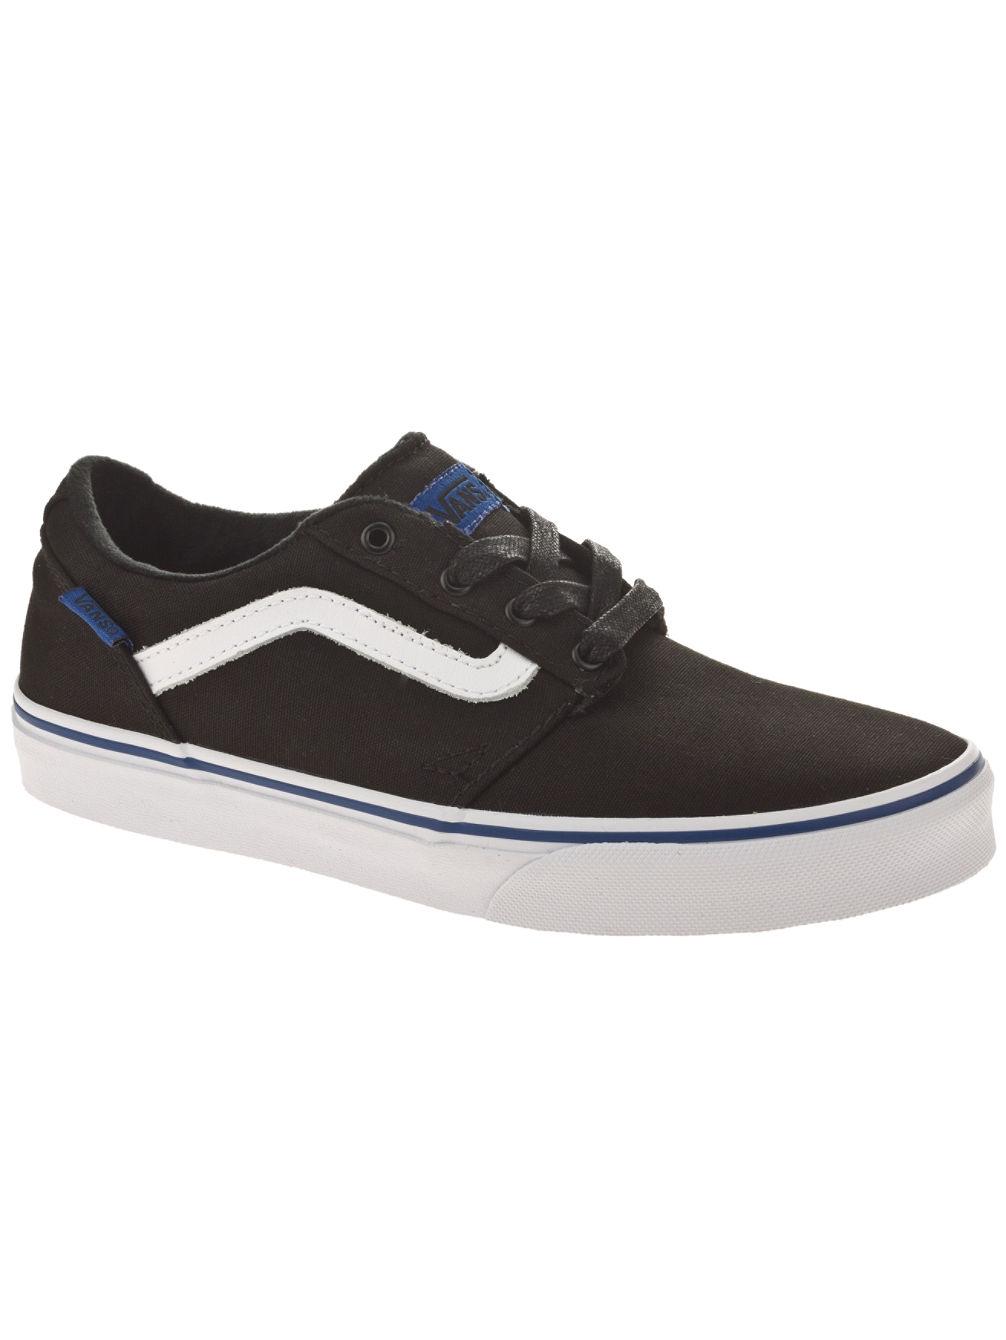 vans shoes black and white boys. chapman stripe sneakers boys. vans shoes black and white boys b